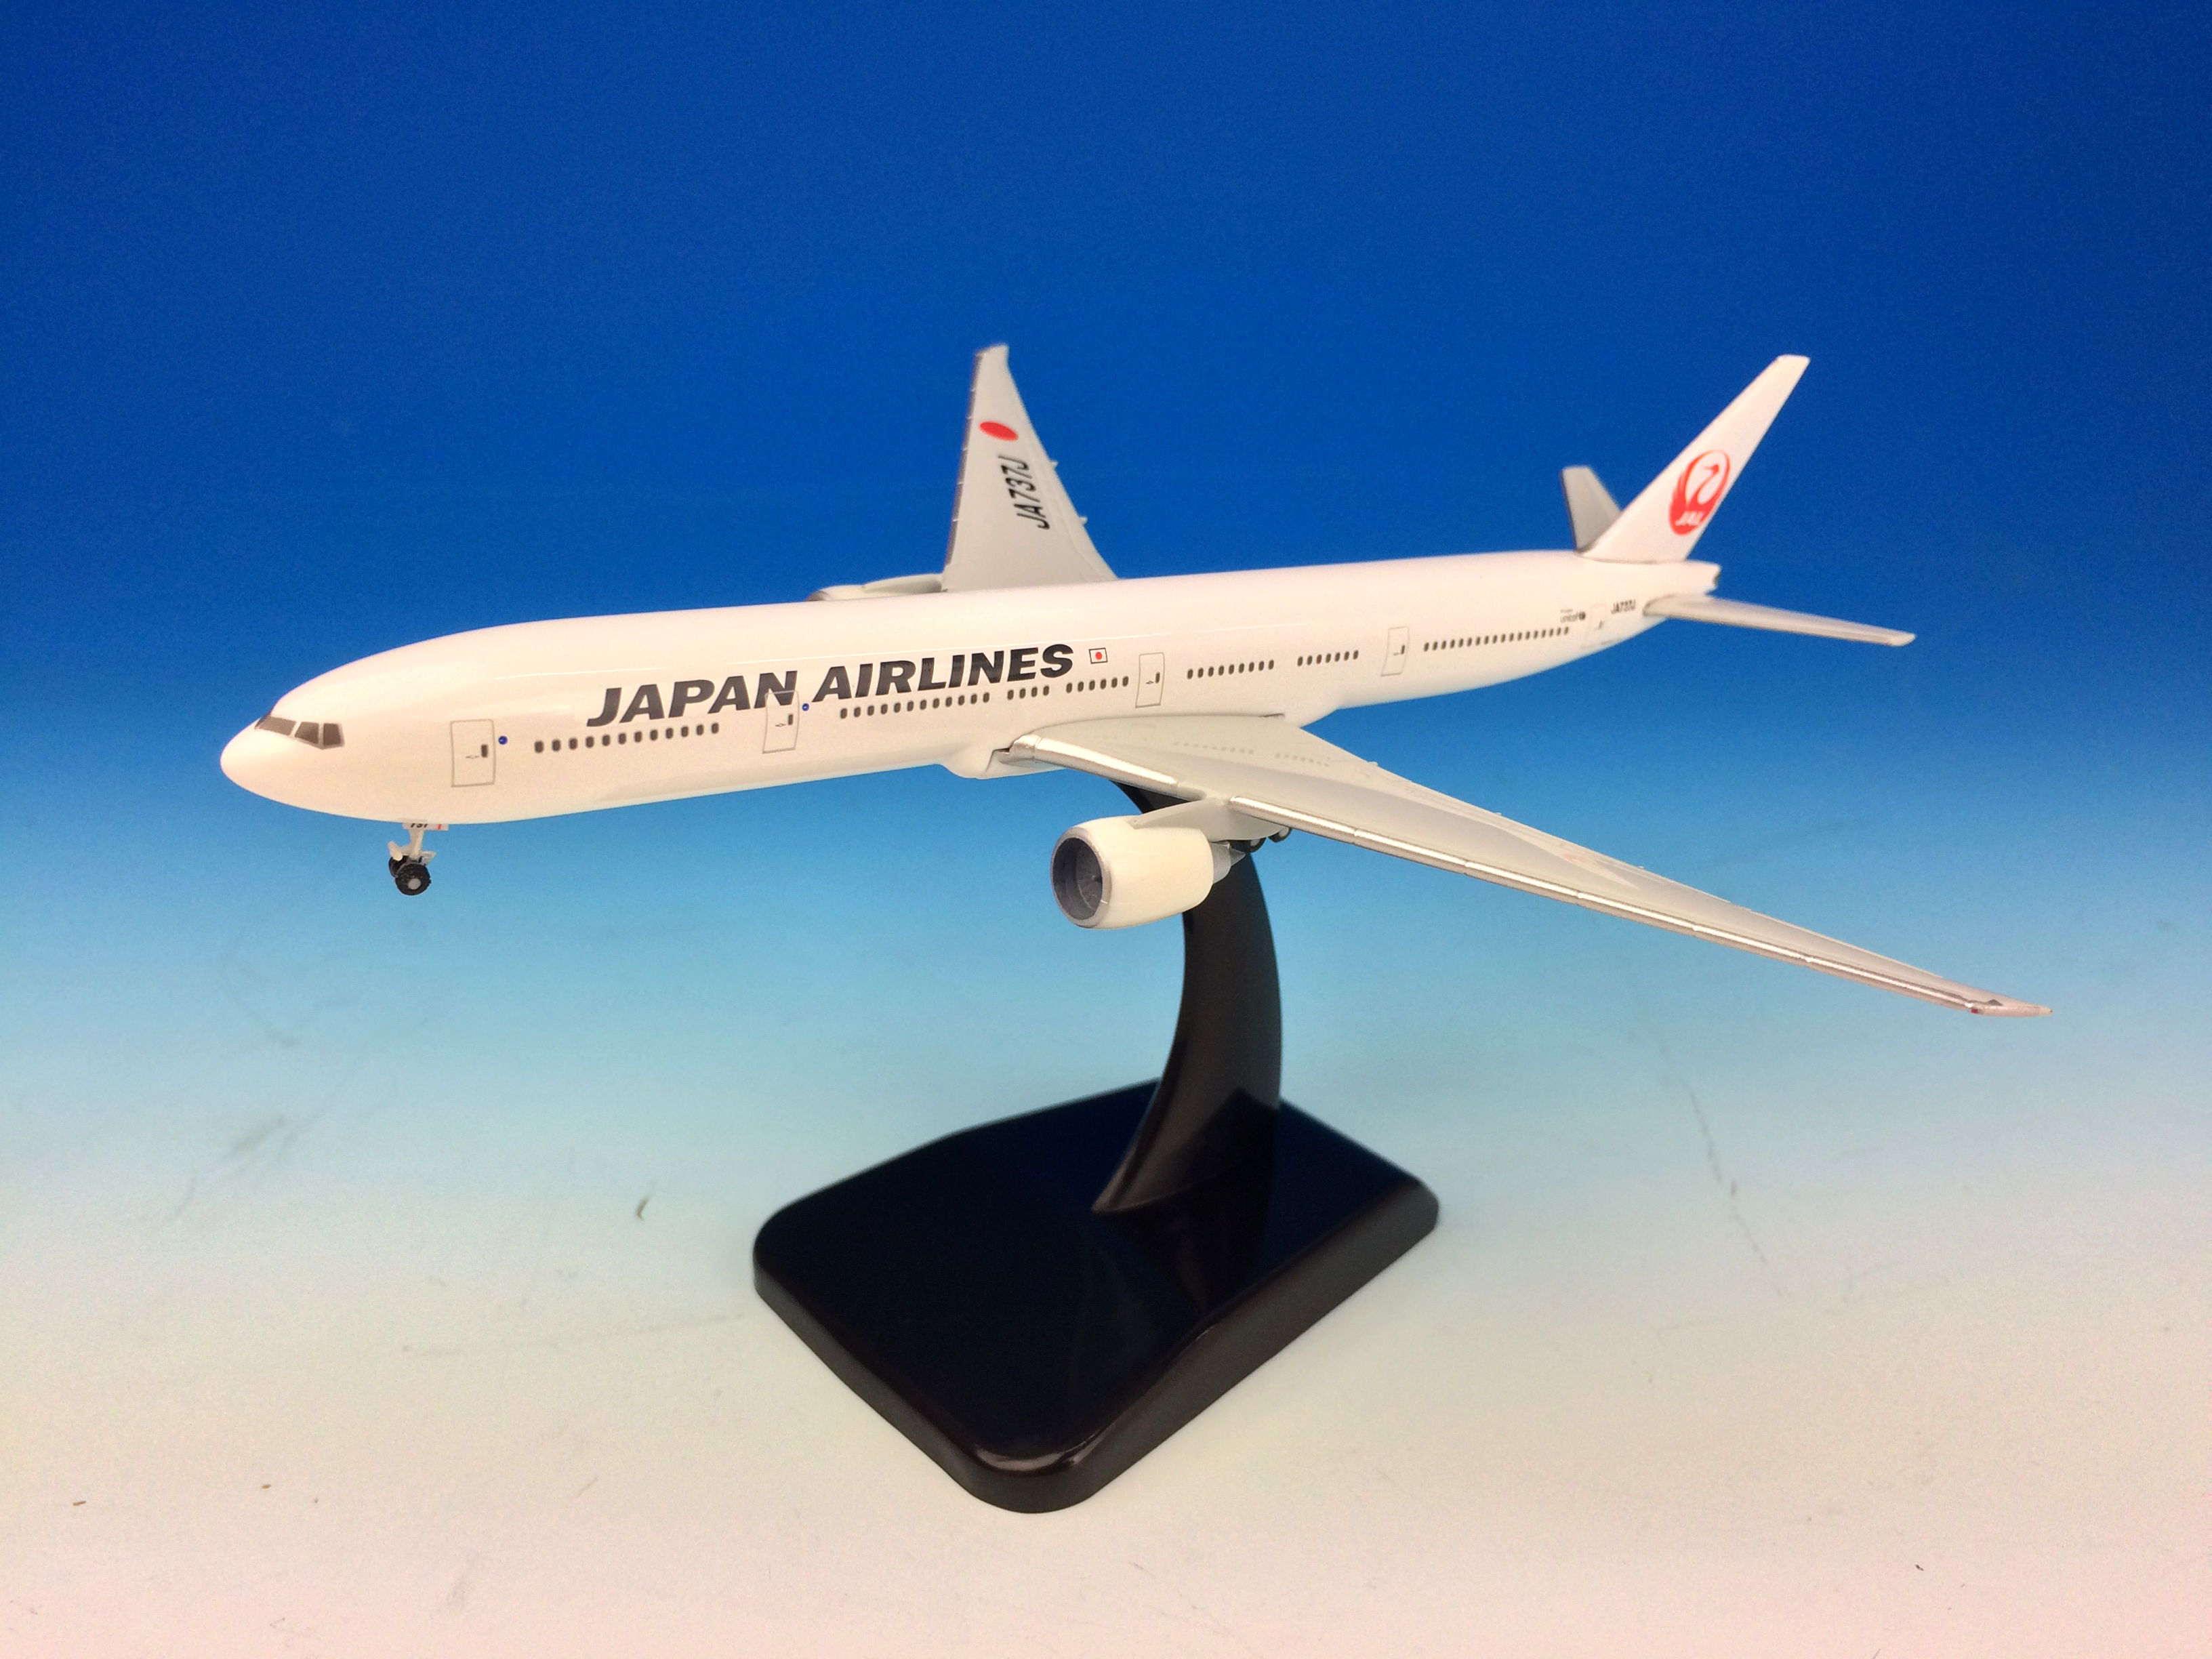 JAL/日本航空 JAL 777-300ER 1/500 ダイキャストモデル